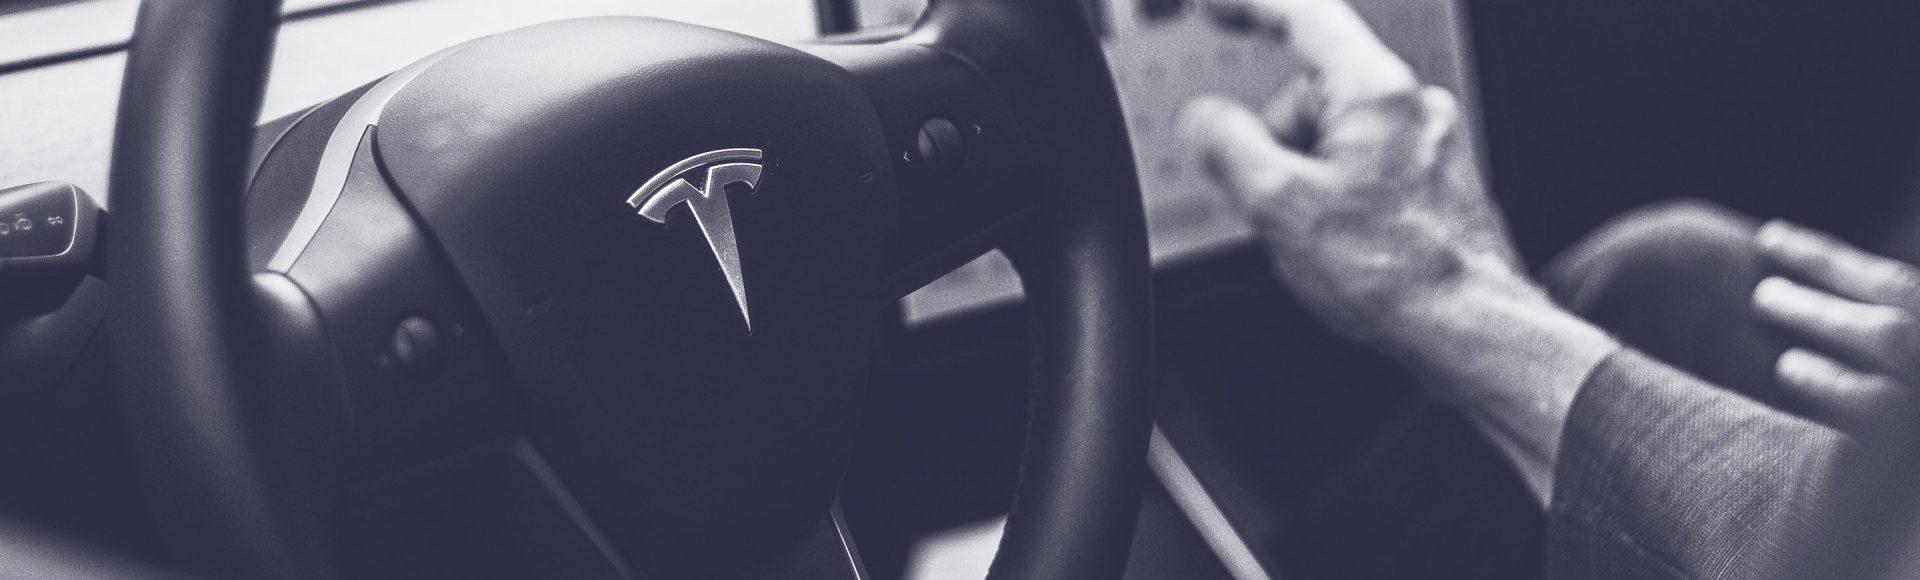 ARK-Invest_Blog-Banner_2015_06_15---Tesla-Battery-Pack